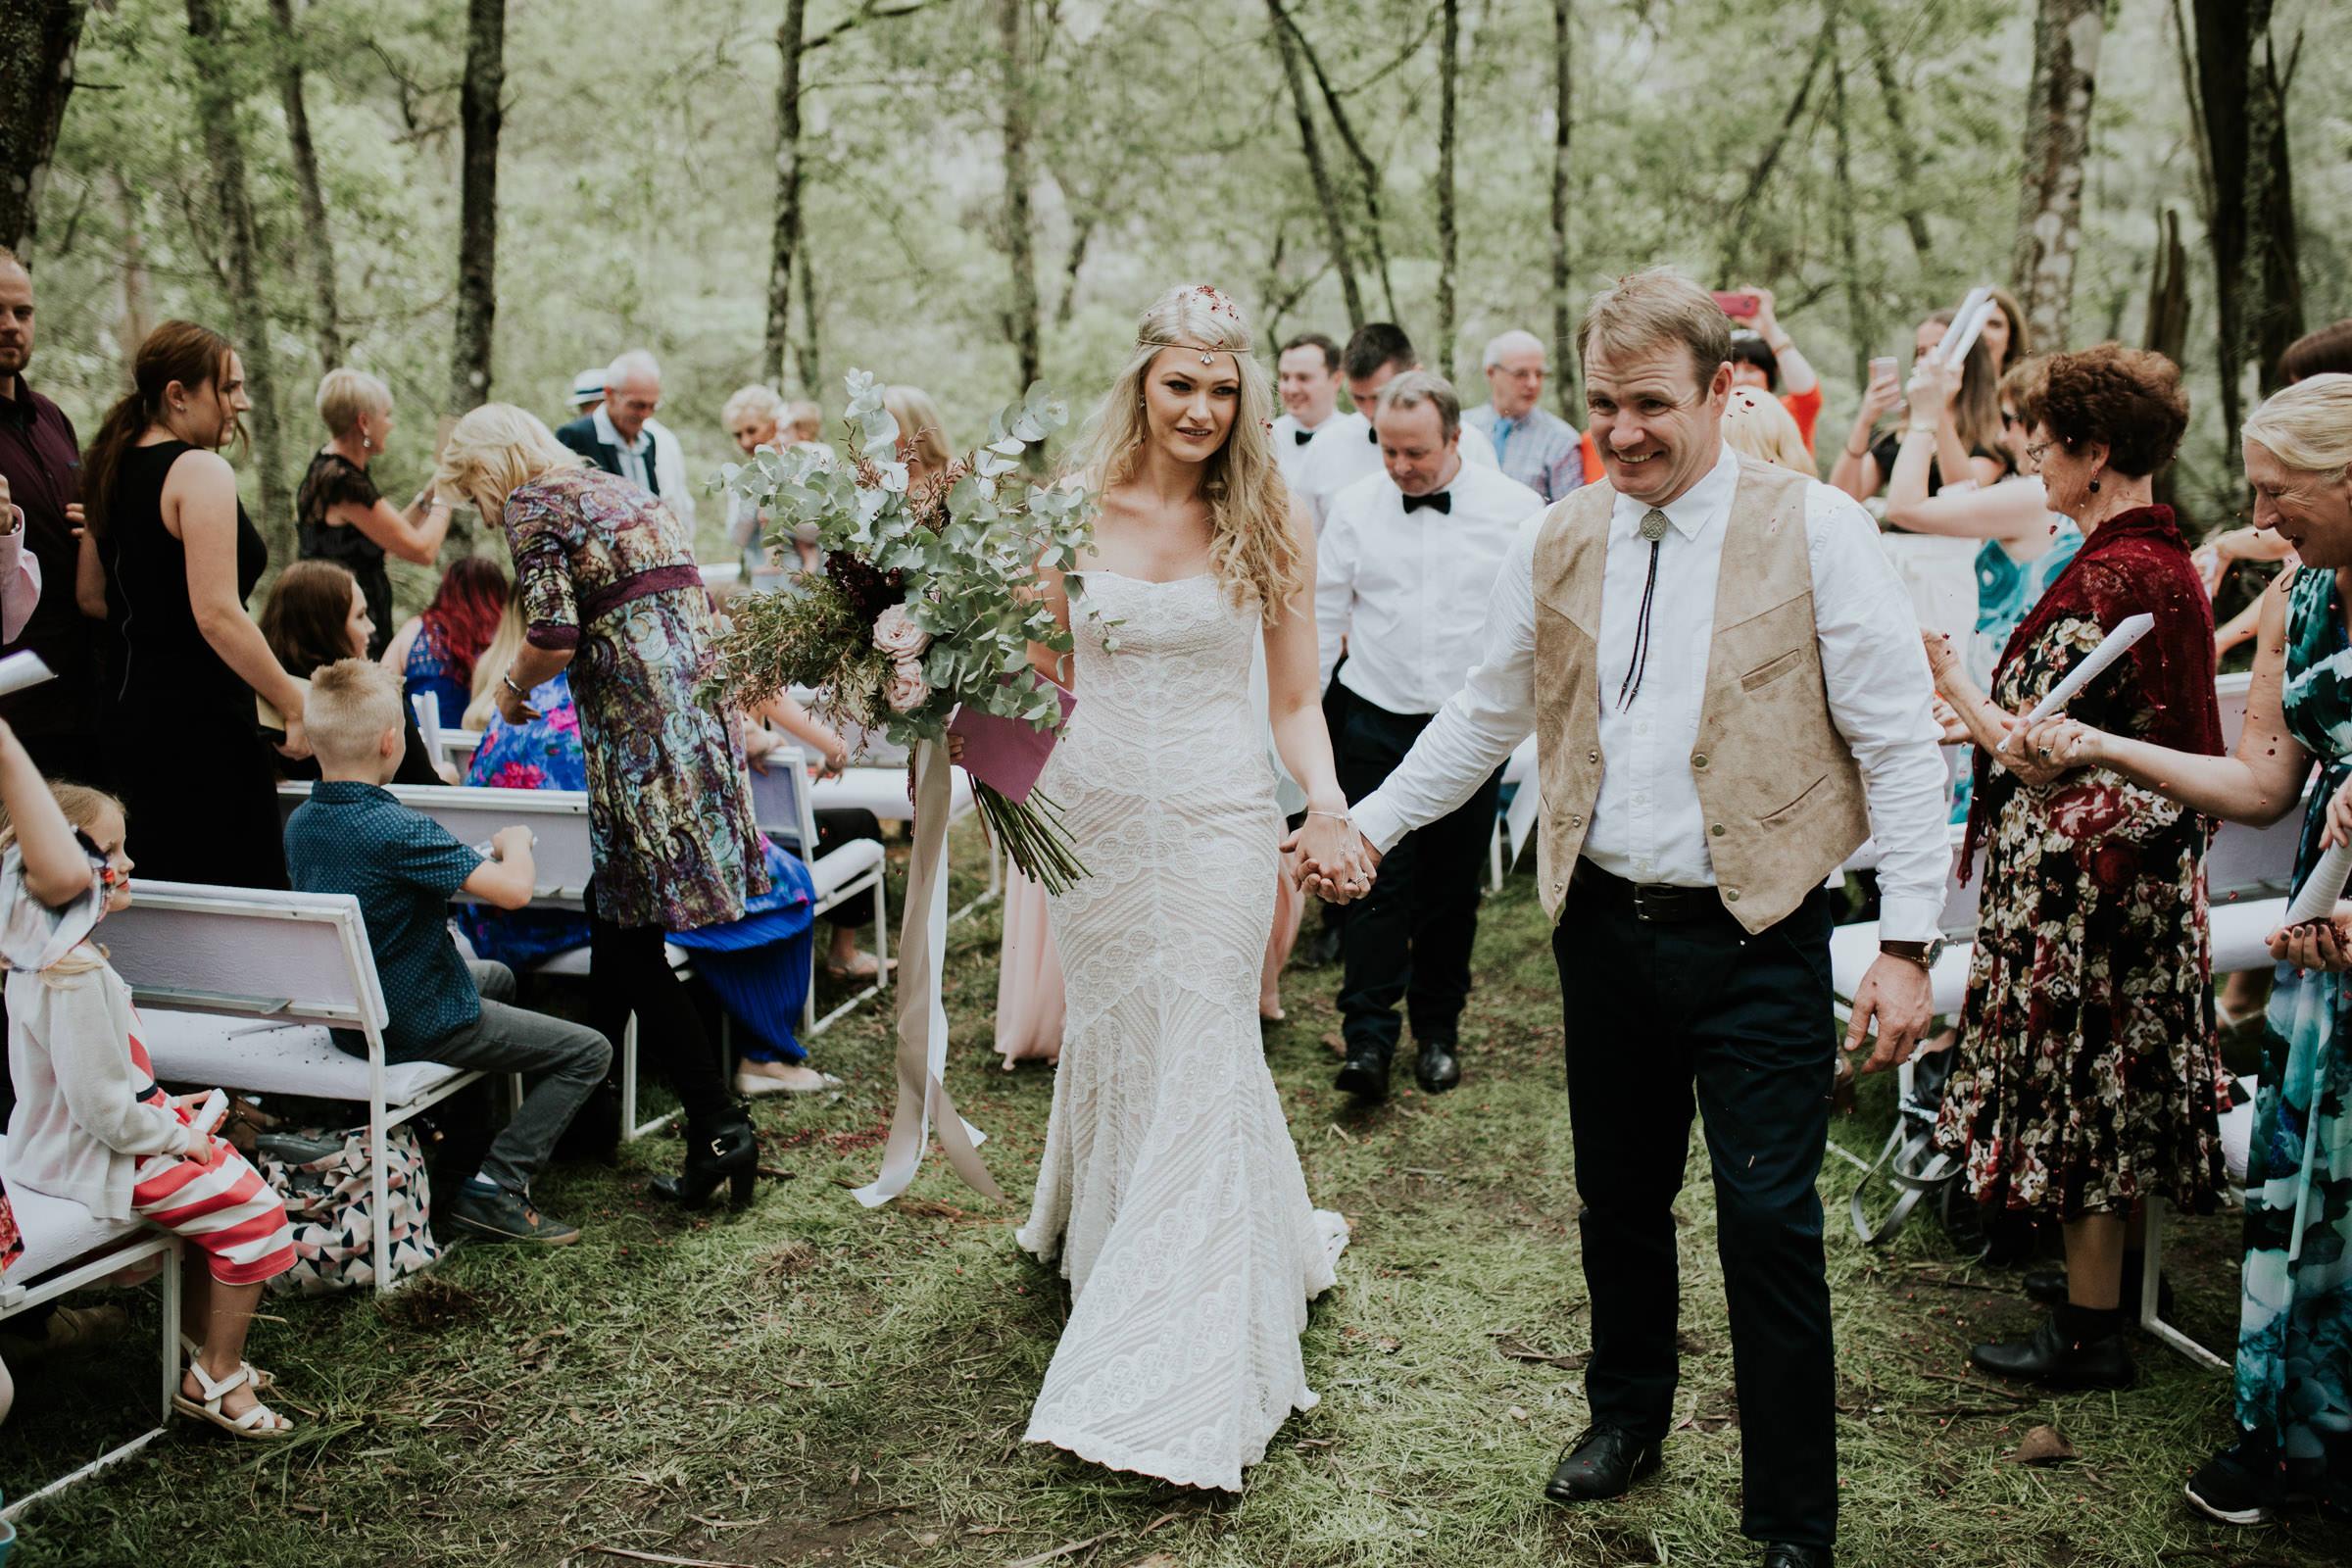 Emma+John+Far+South+Coast+Wedding+Festivl+Glamping+Bush-115.jpg